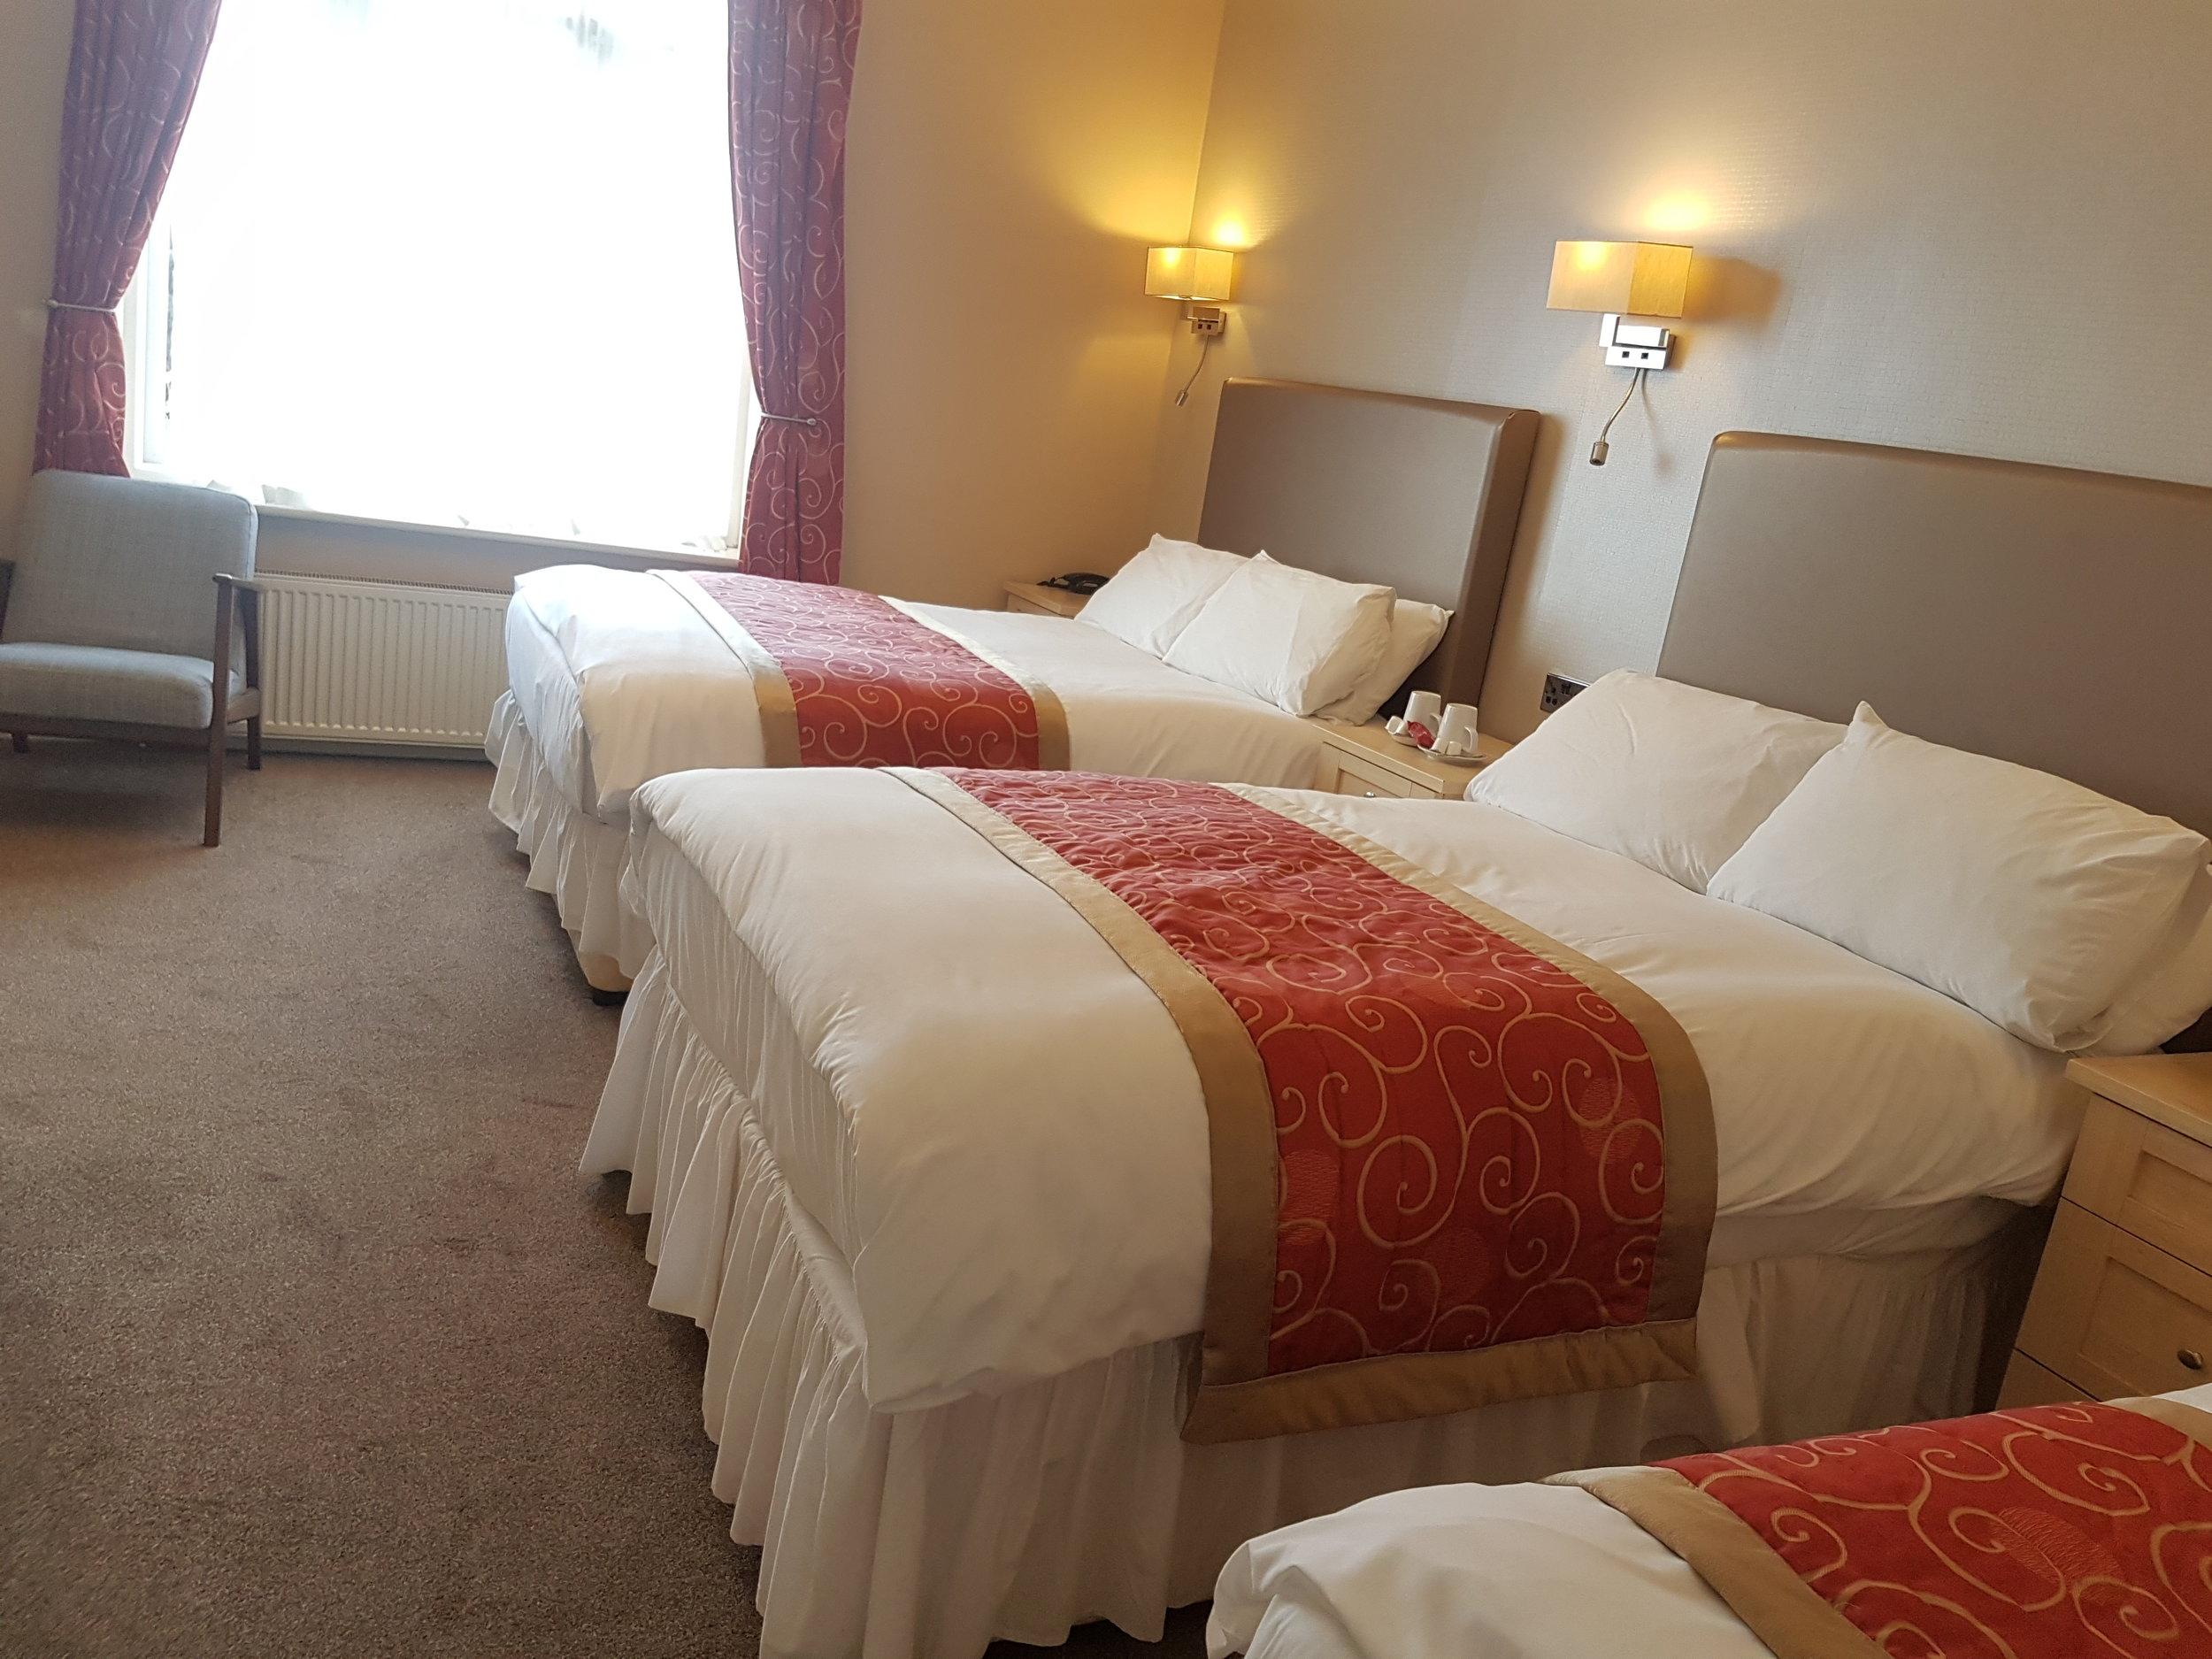 3 bed Family Room (sleeps 4) Victoria Park Lodge Leamington Spa